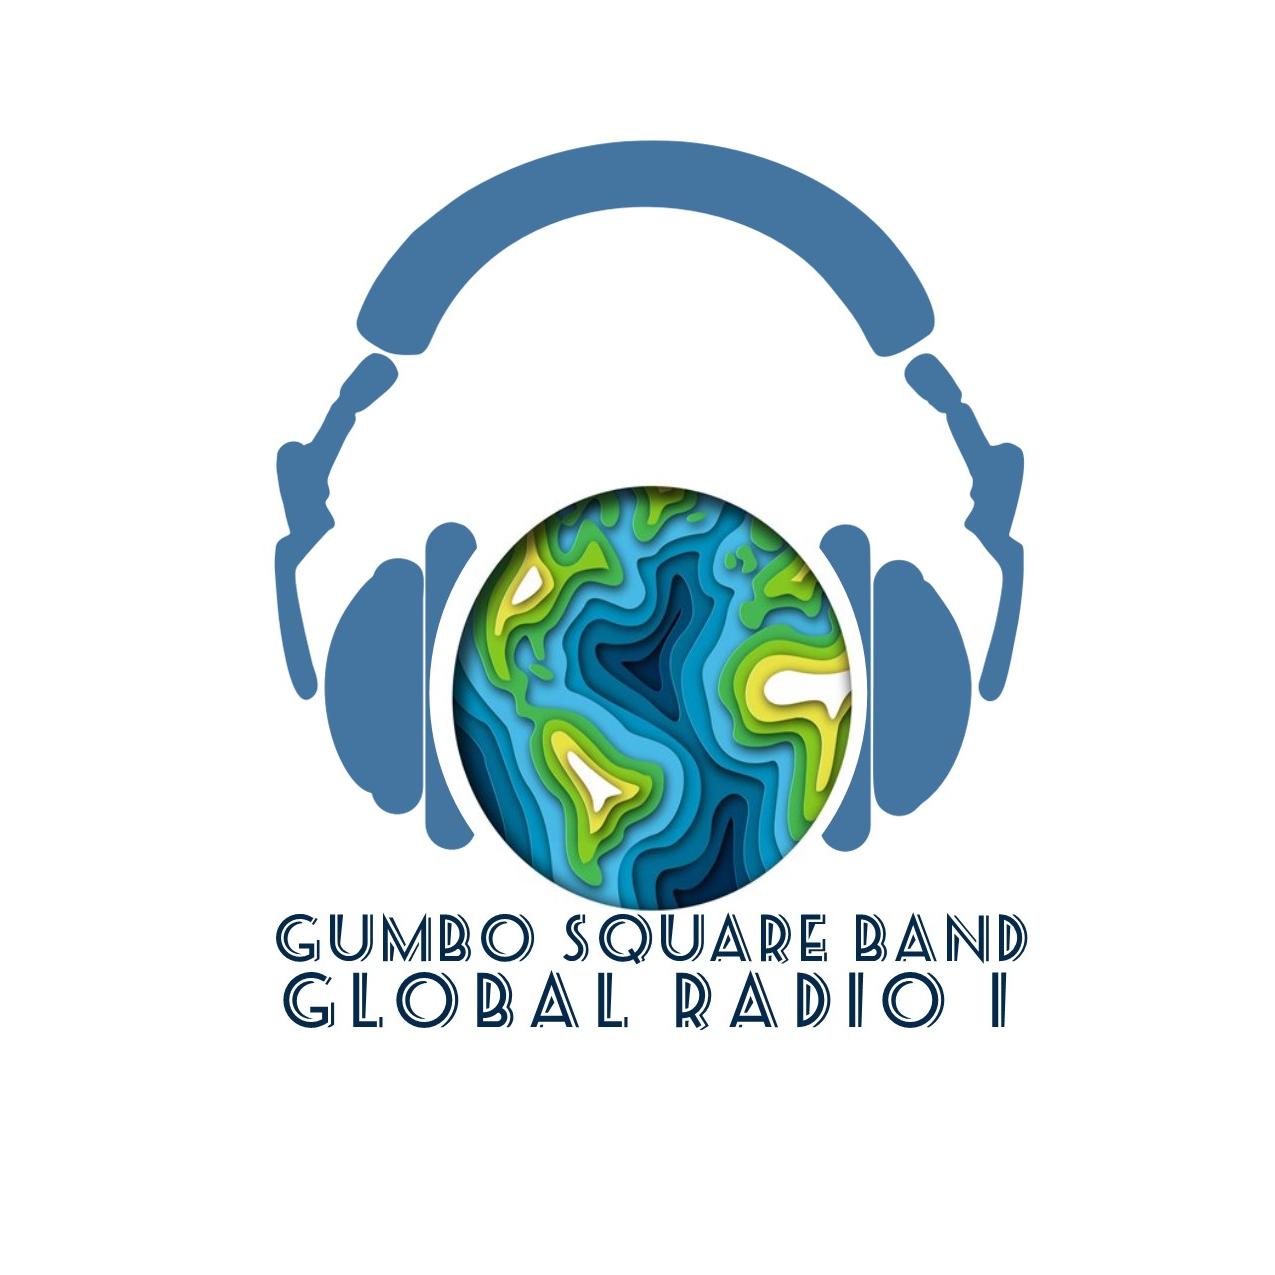 Gumbo Square Band Global Radio One